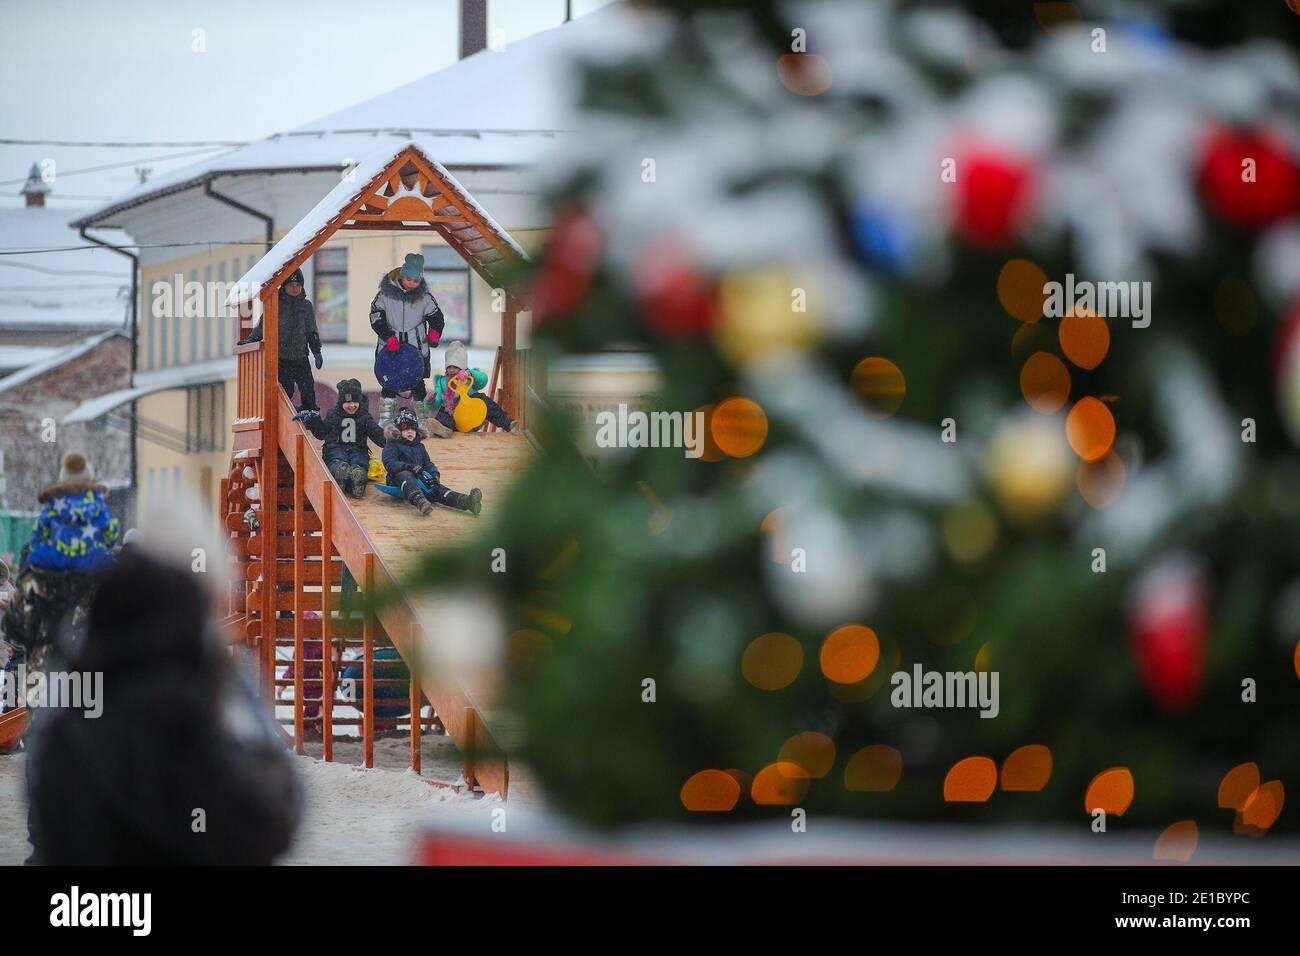 Russian Christmas Calendar 2021 Page 9 Christmas Eve Calendar High Resolution Stock Photography And Images Alamy